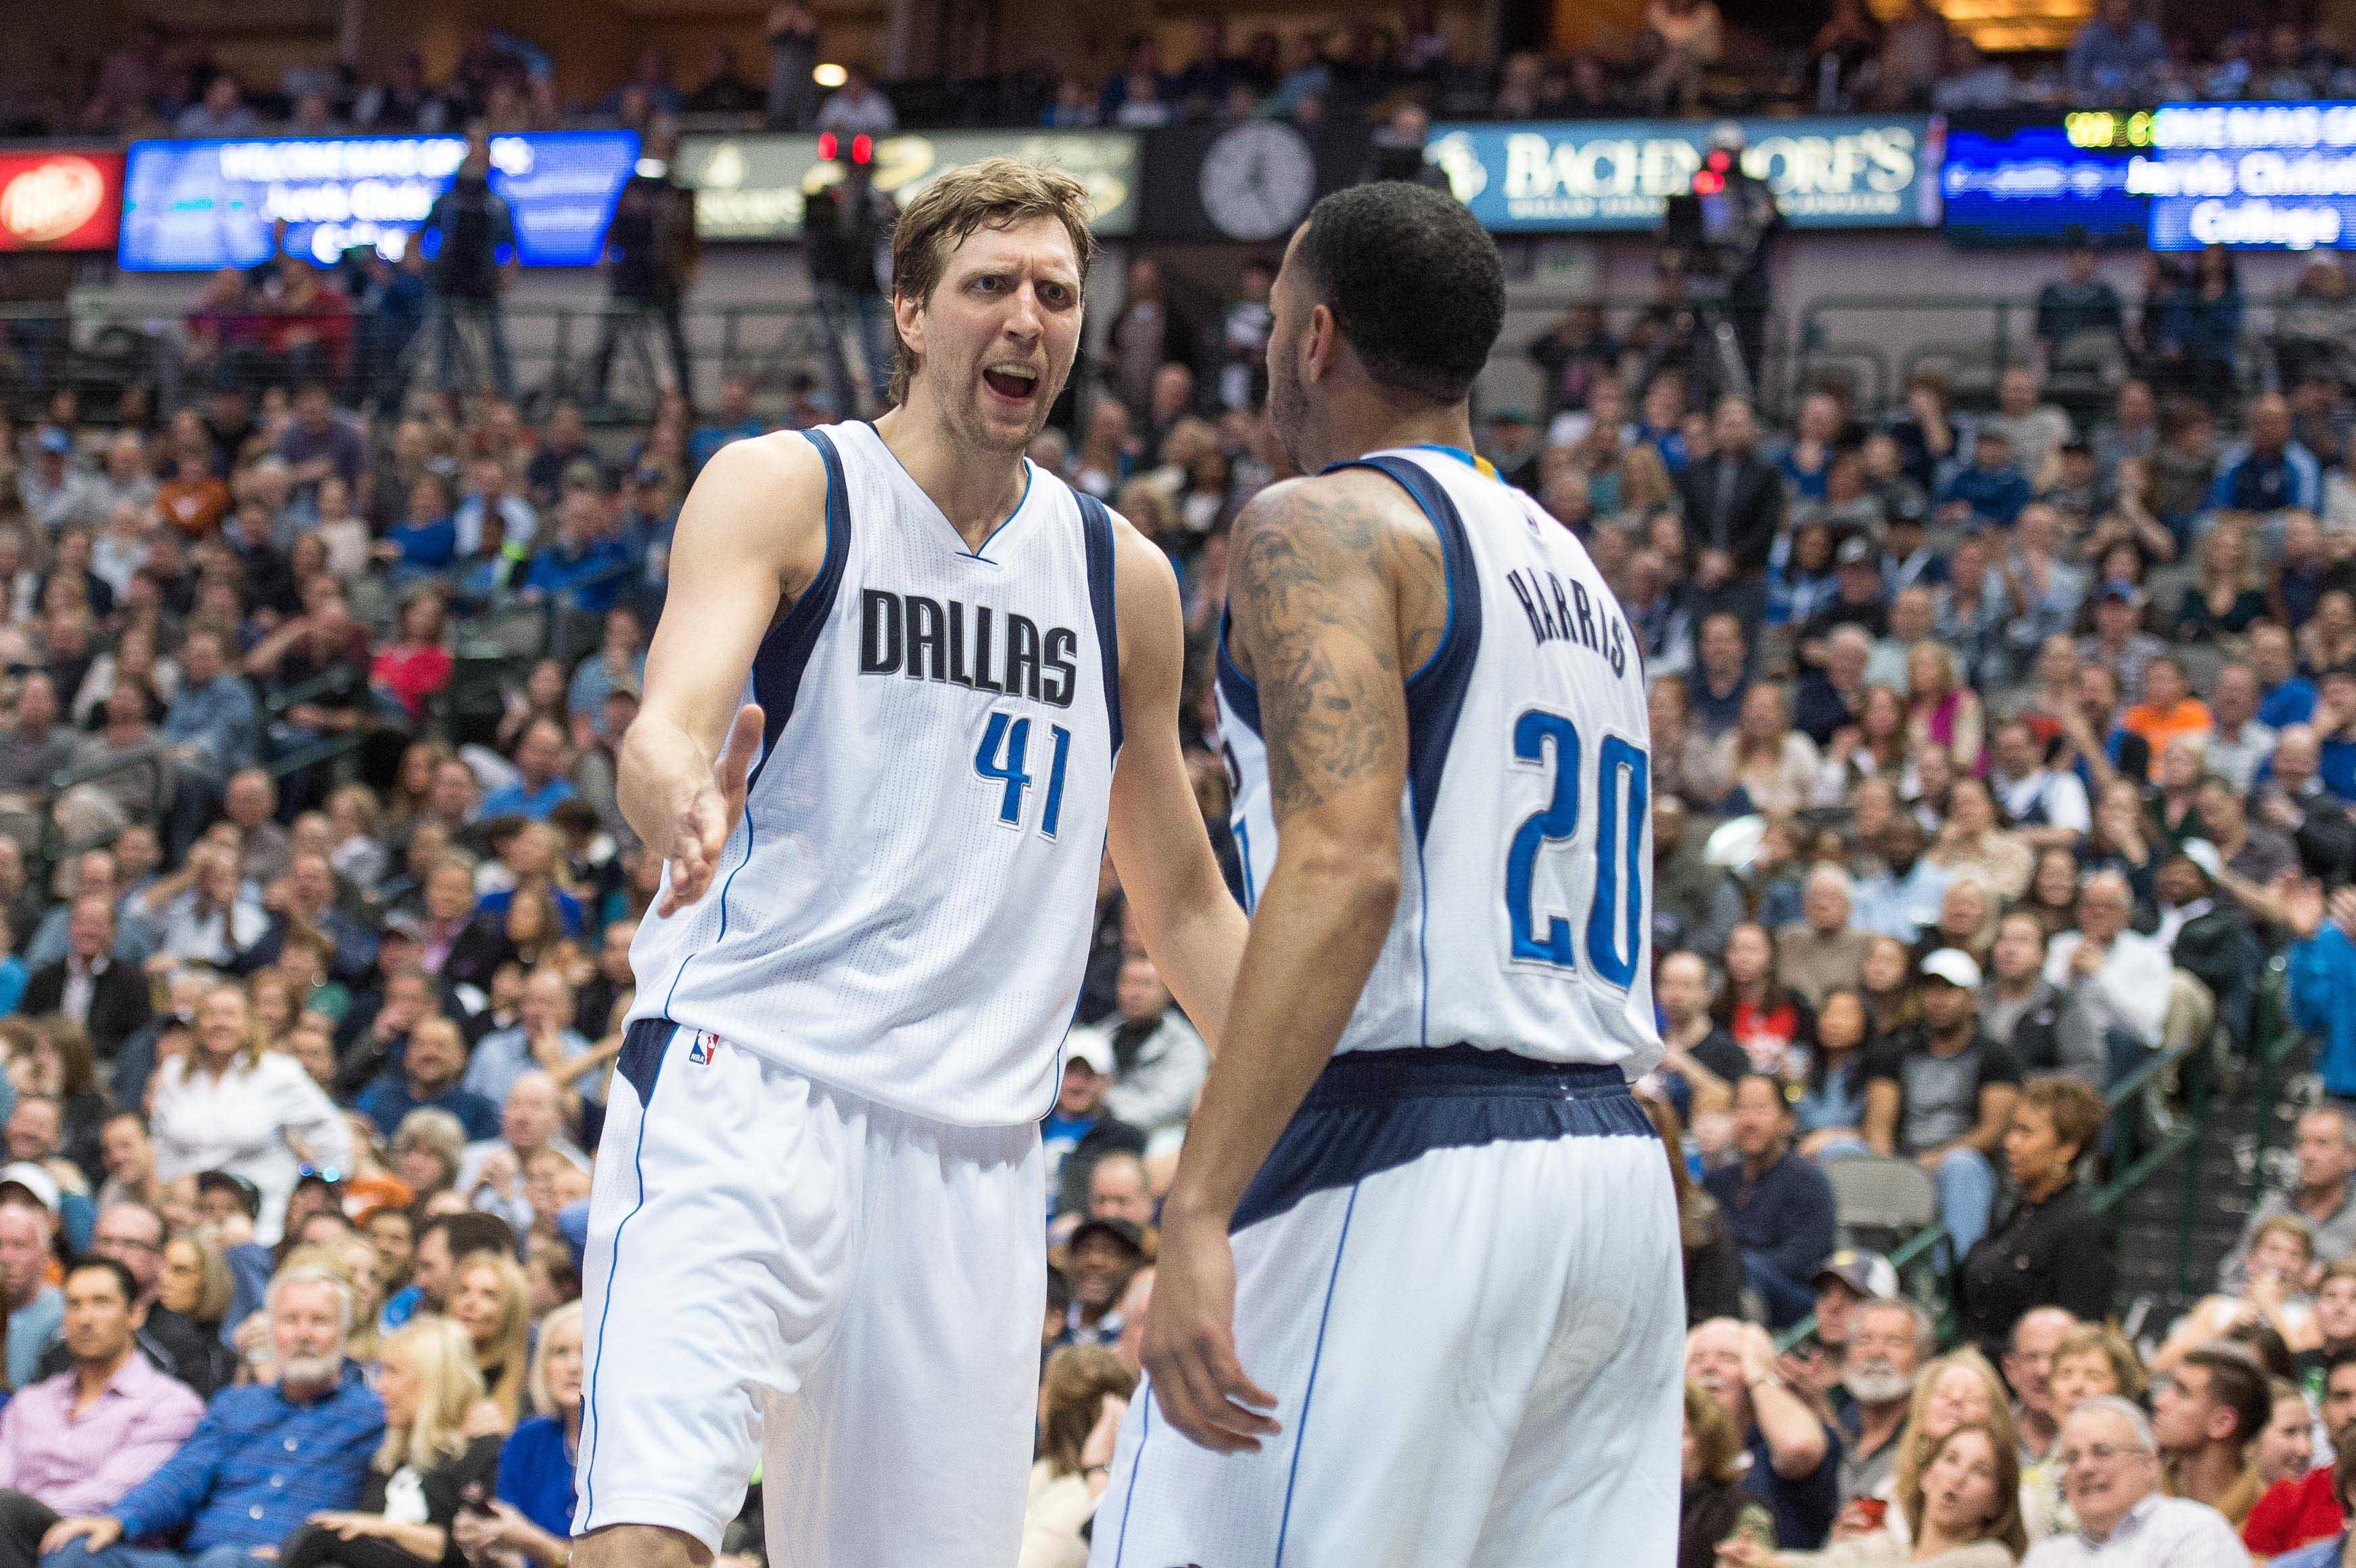 NBA scores 2015: Vintage Dirk Nowitzki leads late Mavericks' comeback against Blazers